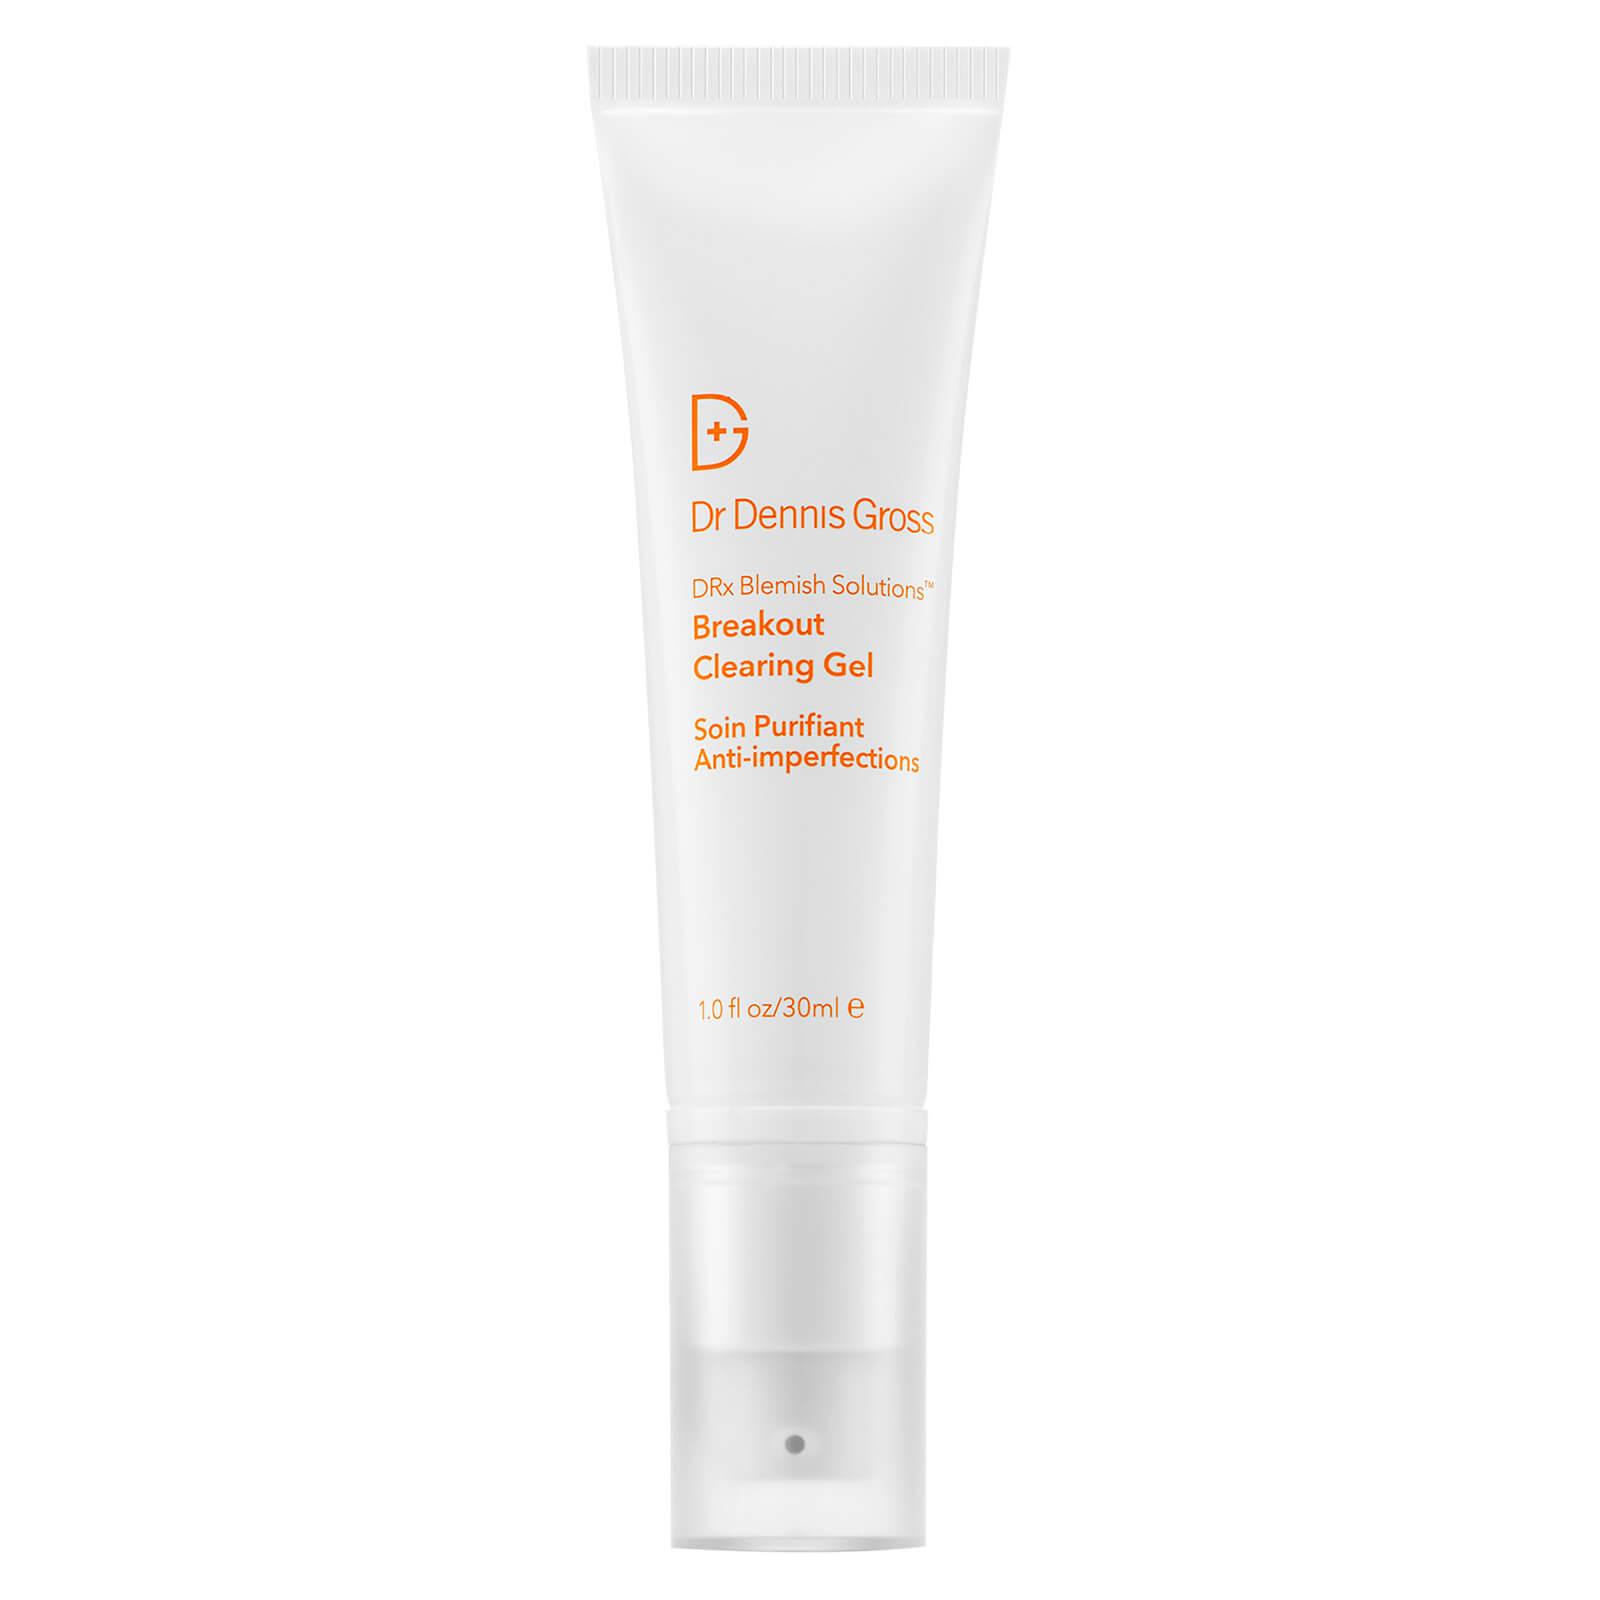 Купить Dr Dennis Gross Skincare DRx Blemish Solutions Breakout Clearing Gel 30ml